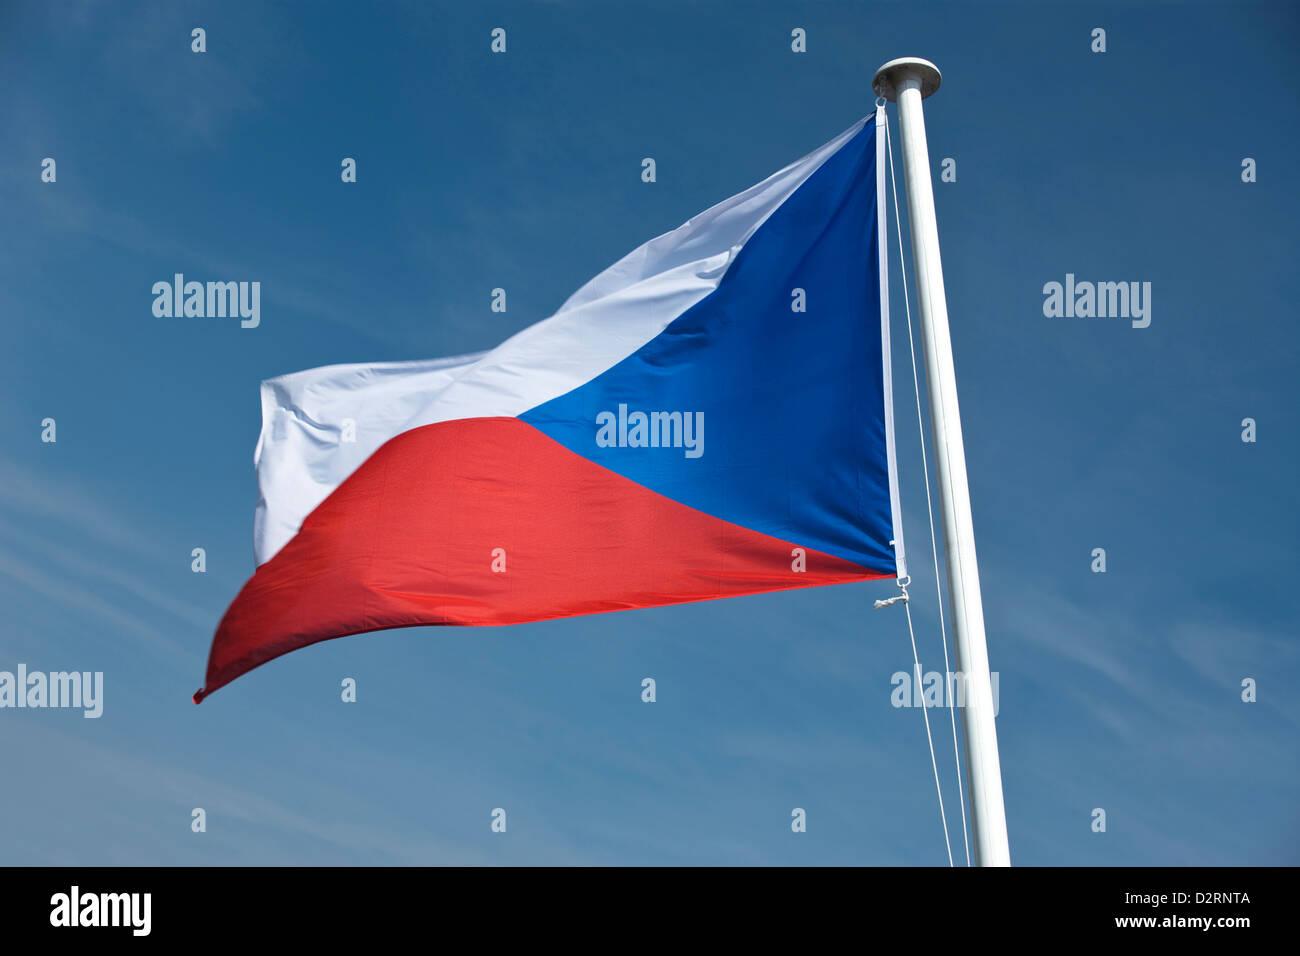 CZECH REPUBLIC FLAG FLYING ON FLAGPOLE - Stock Image